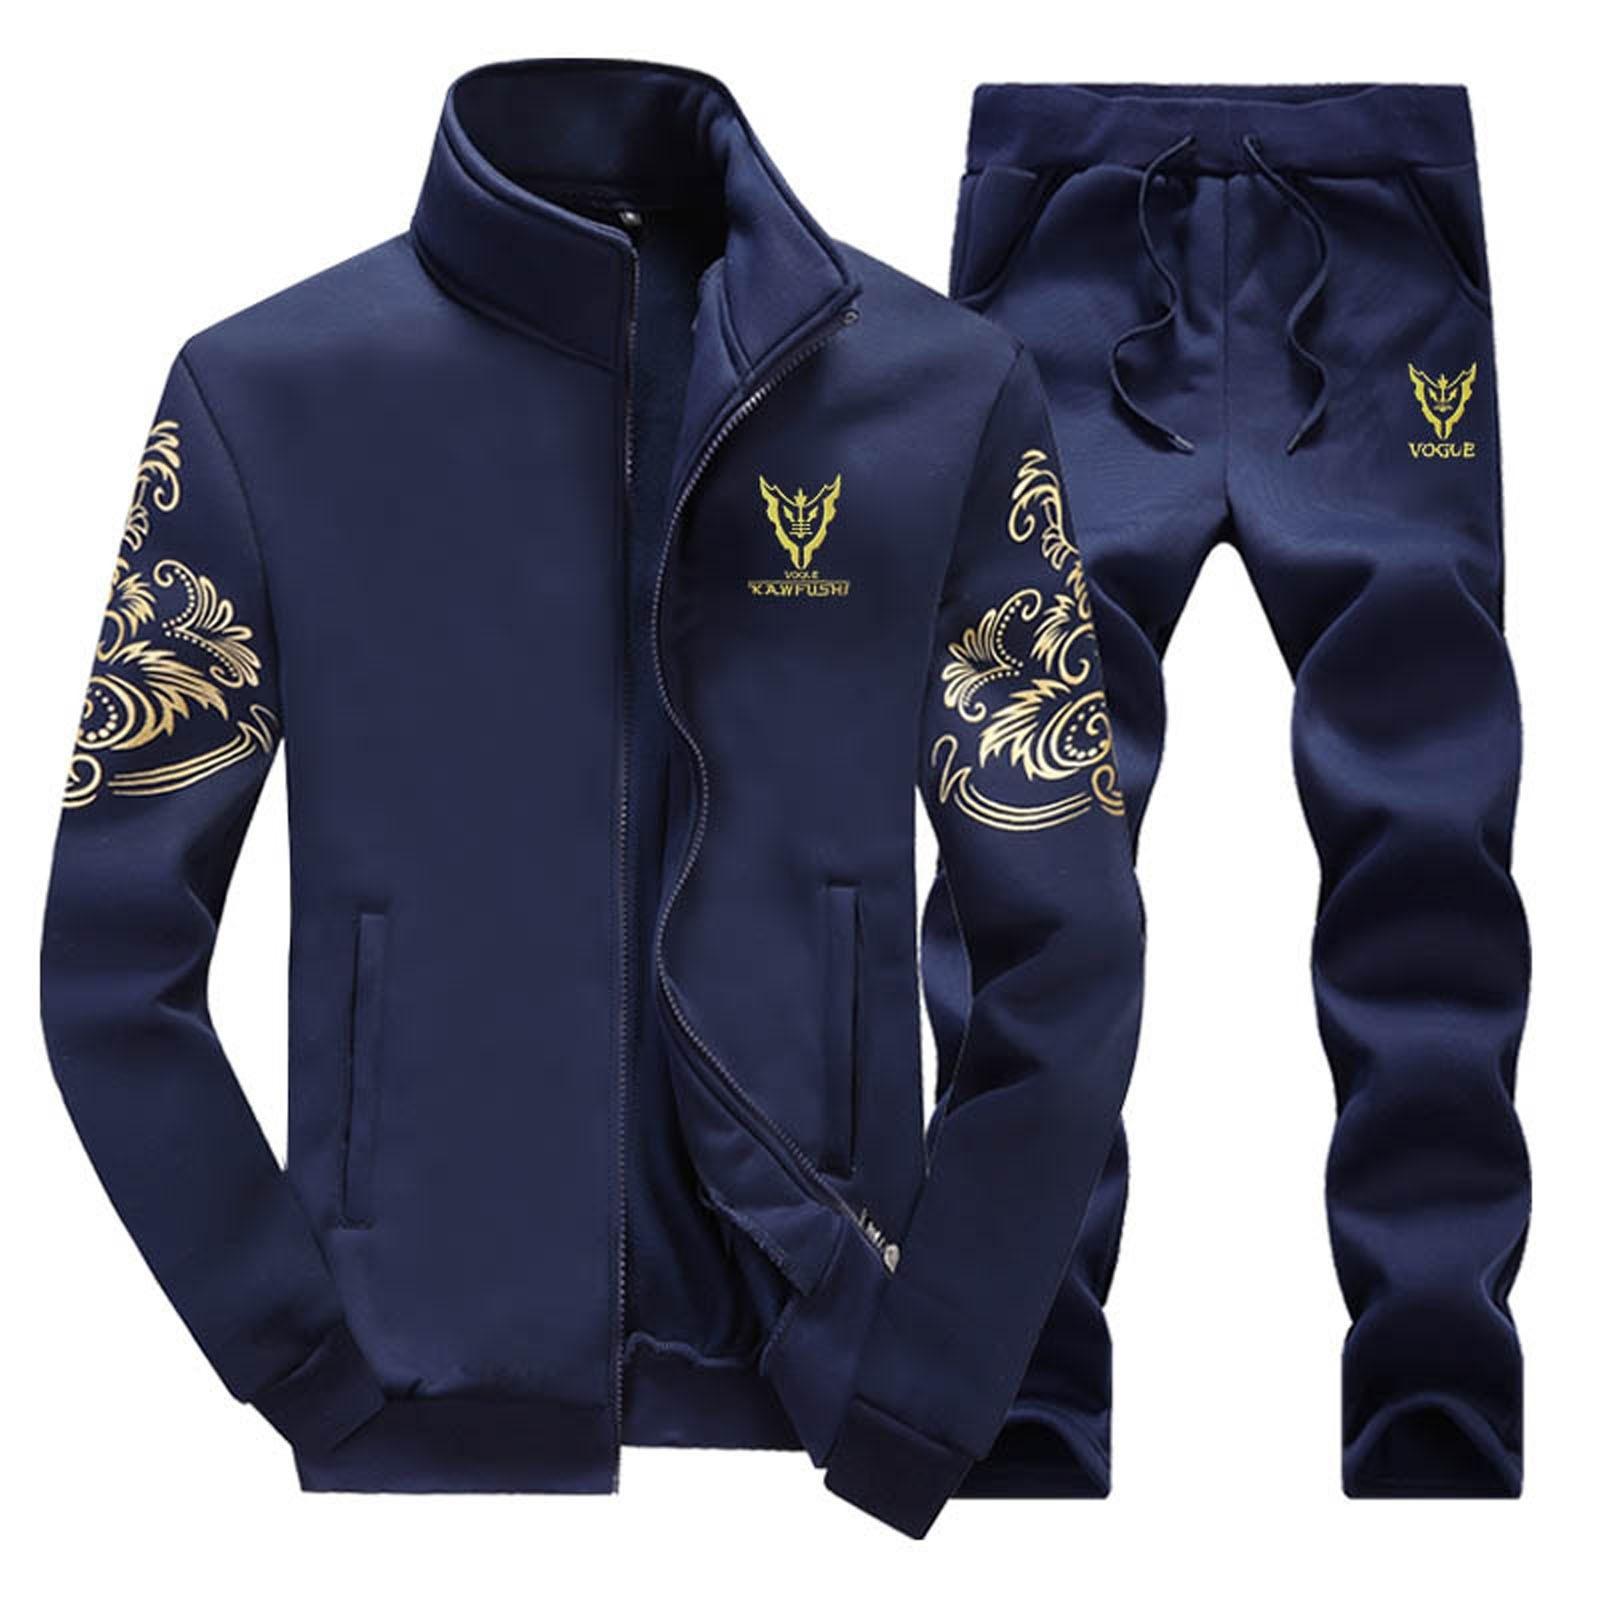 Chaqueta De Los Hombres Men s Winter Sport Wear Tracksuit Clothes Outfits Set Coat long Sweatpants